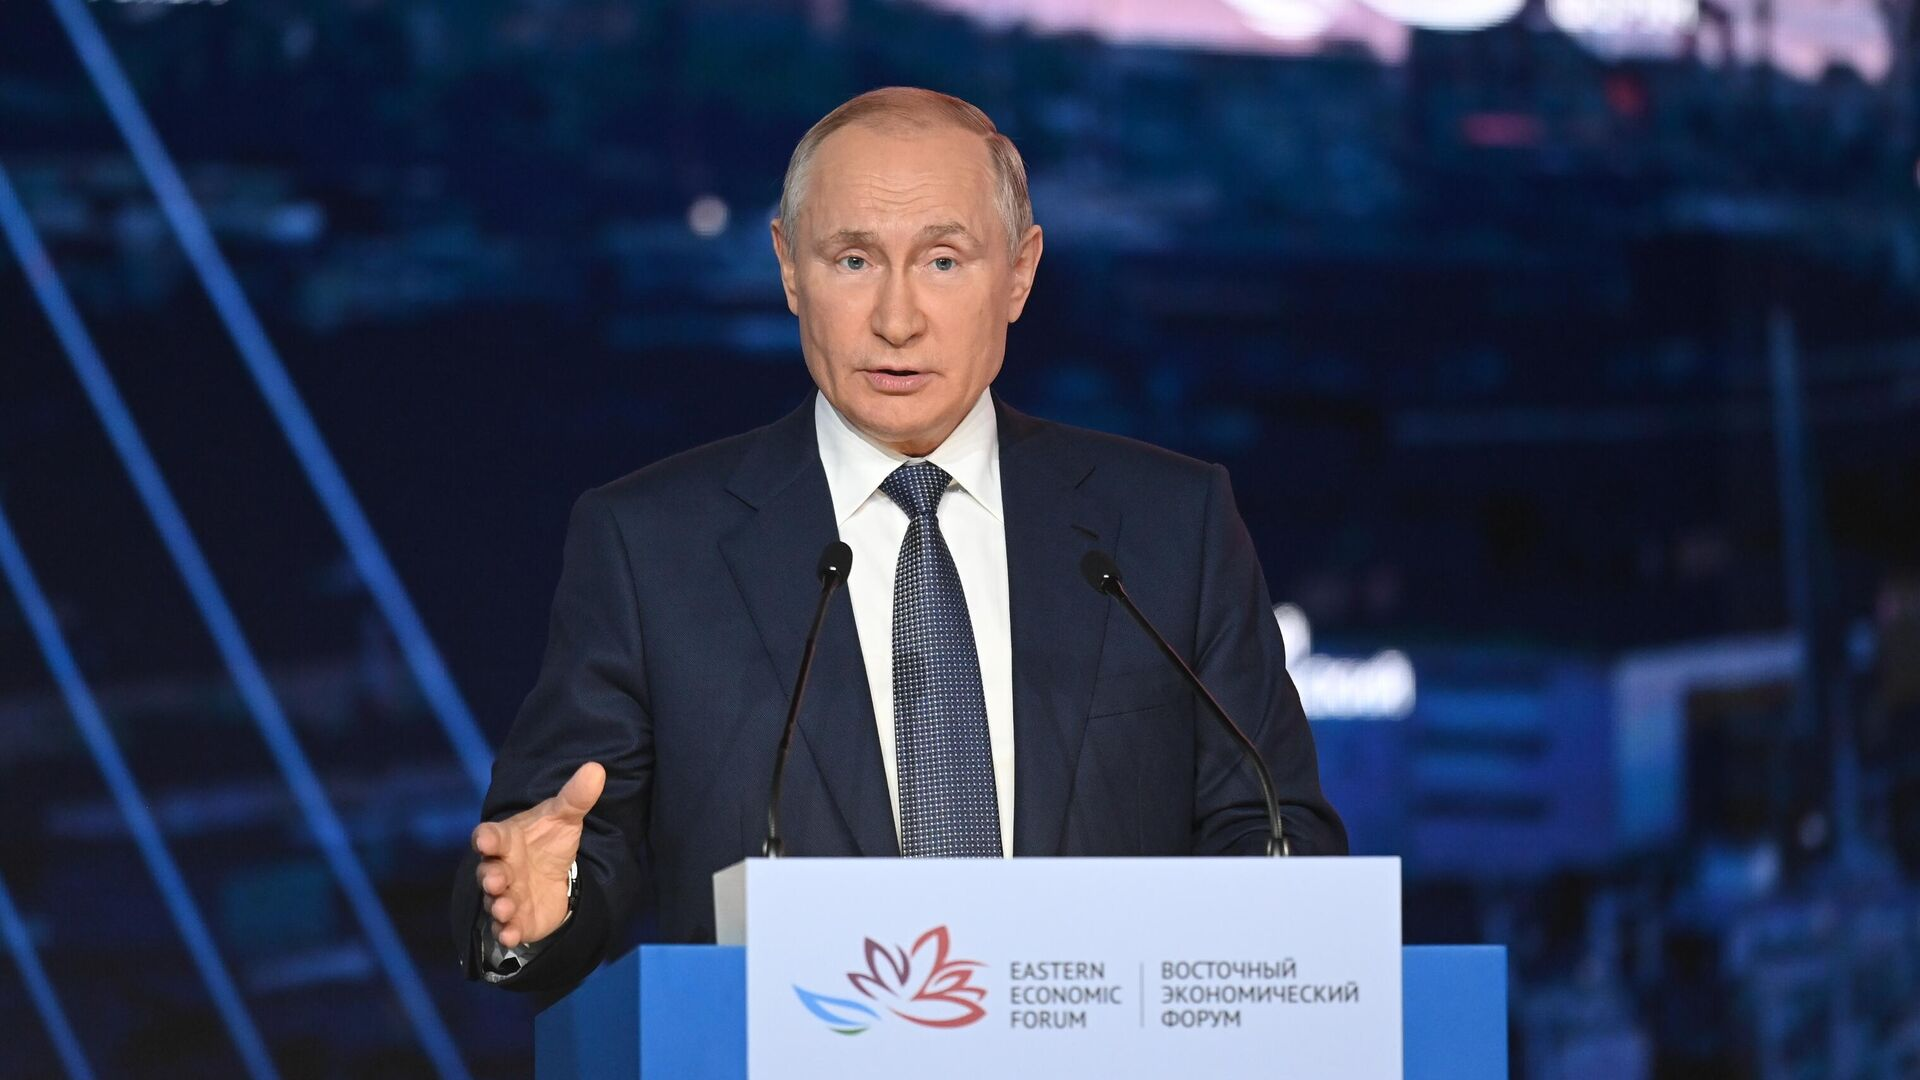 Россия заинтересована в развитии сотрудничества с Италией, заявил Путин